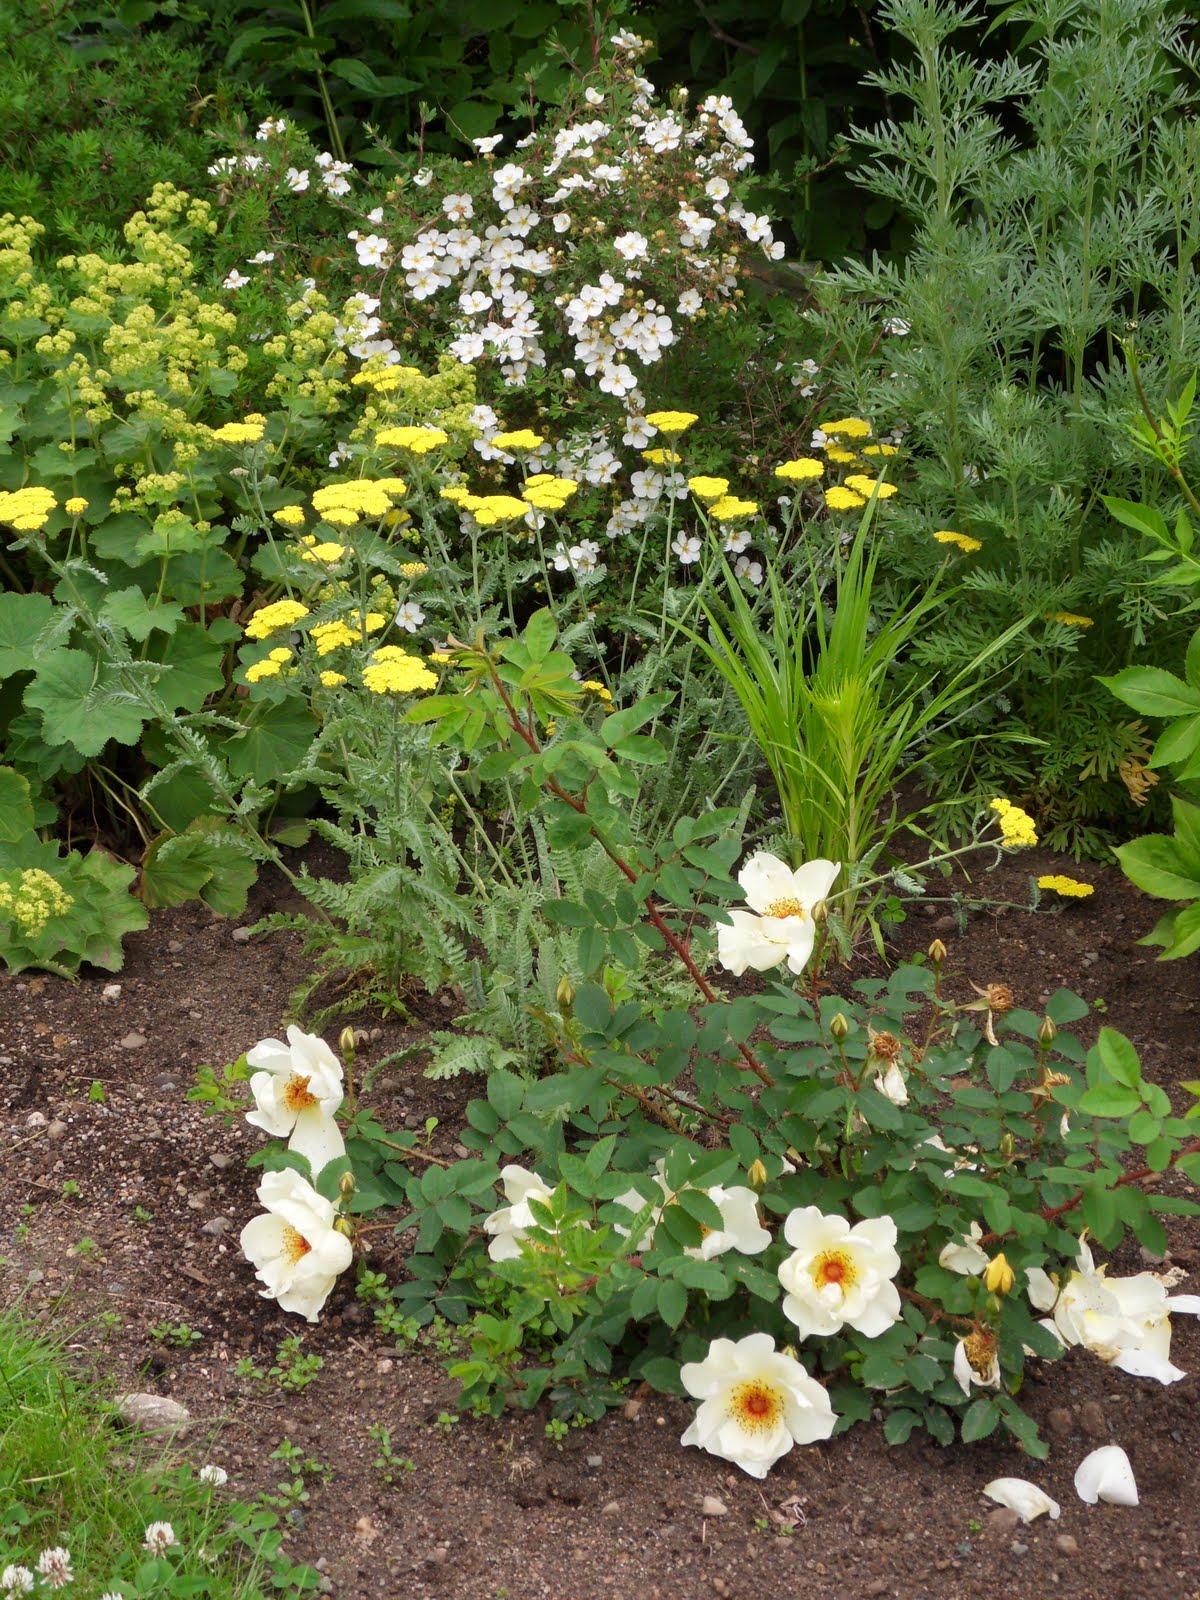 Hageliv og hagedesign: Det gule bedet ved pallekarmene tar form